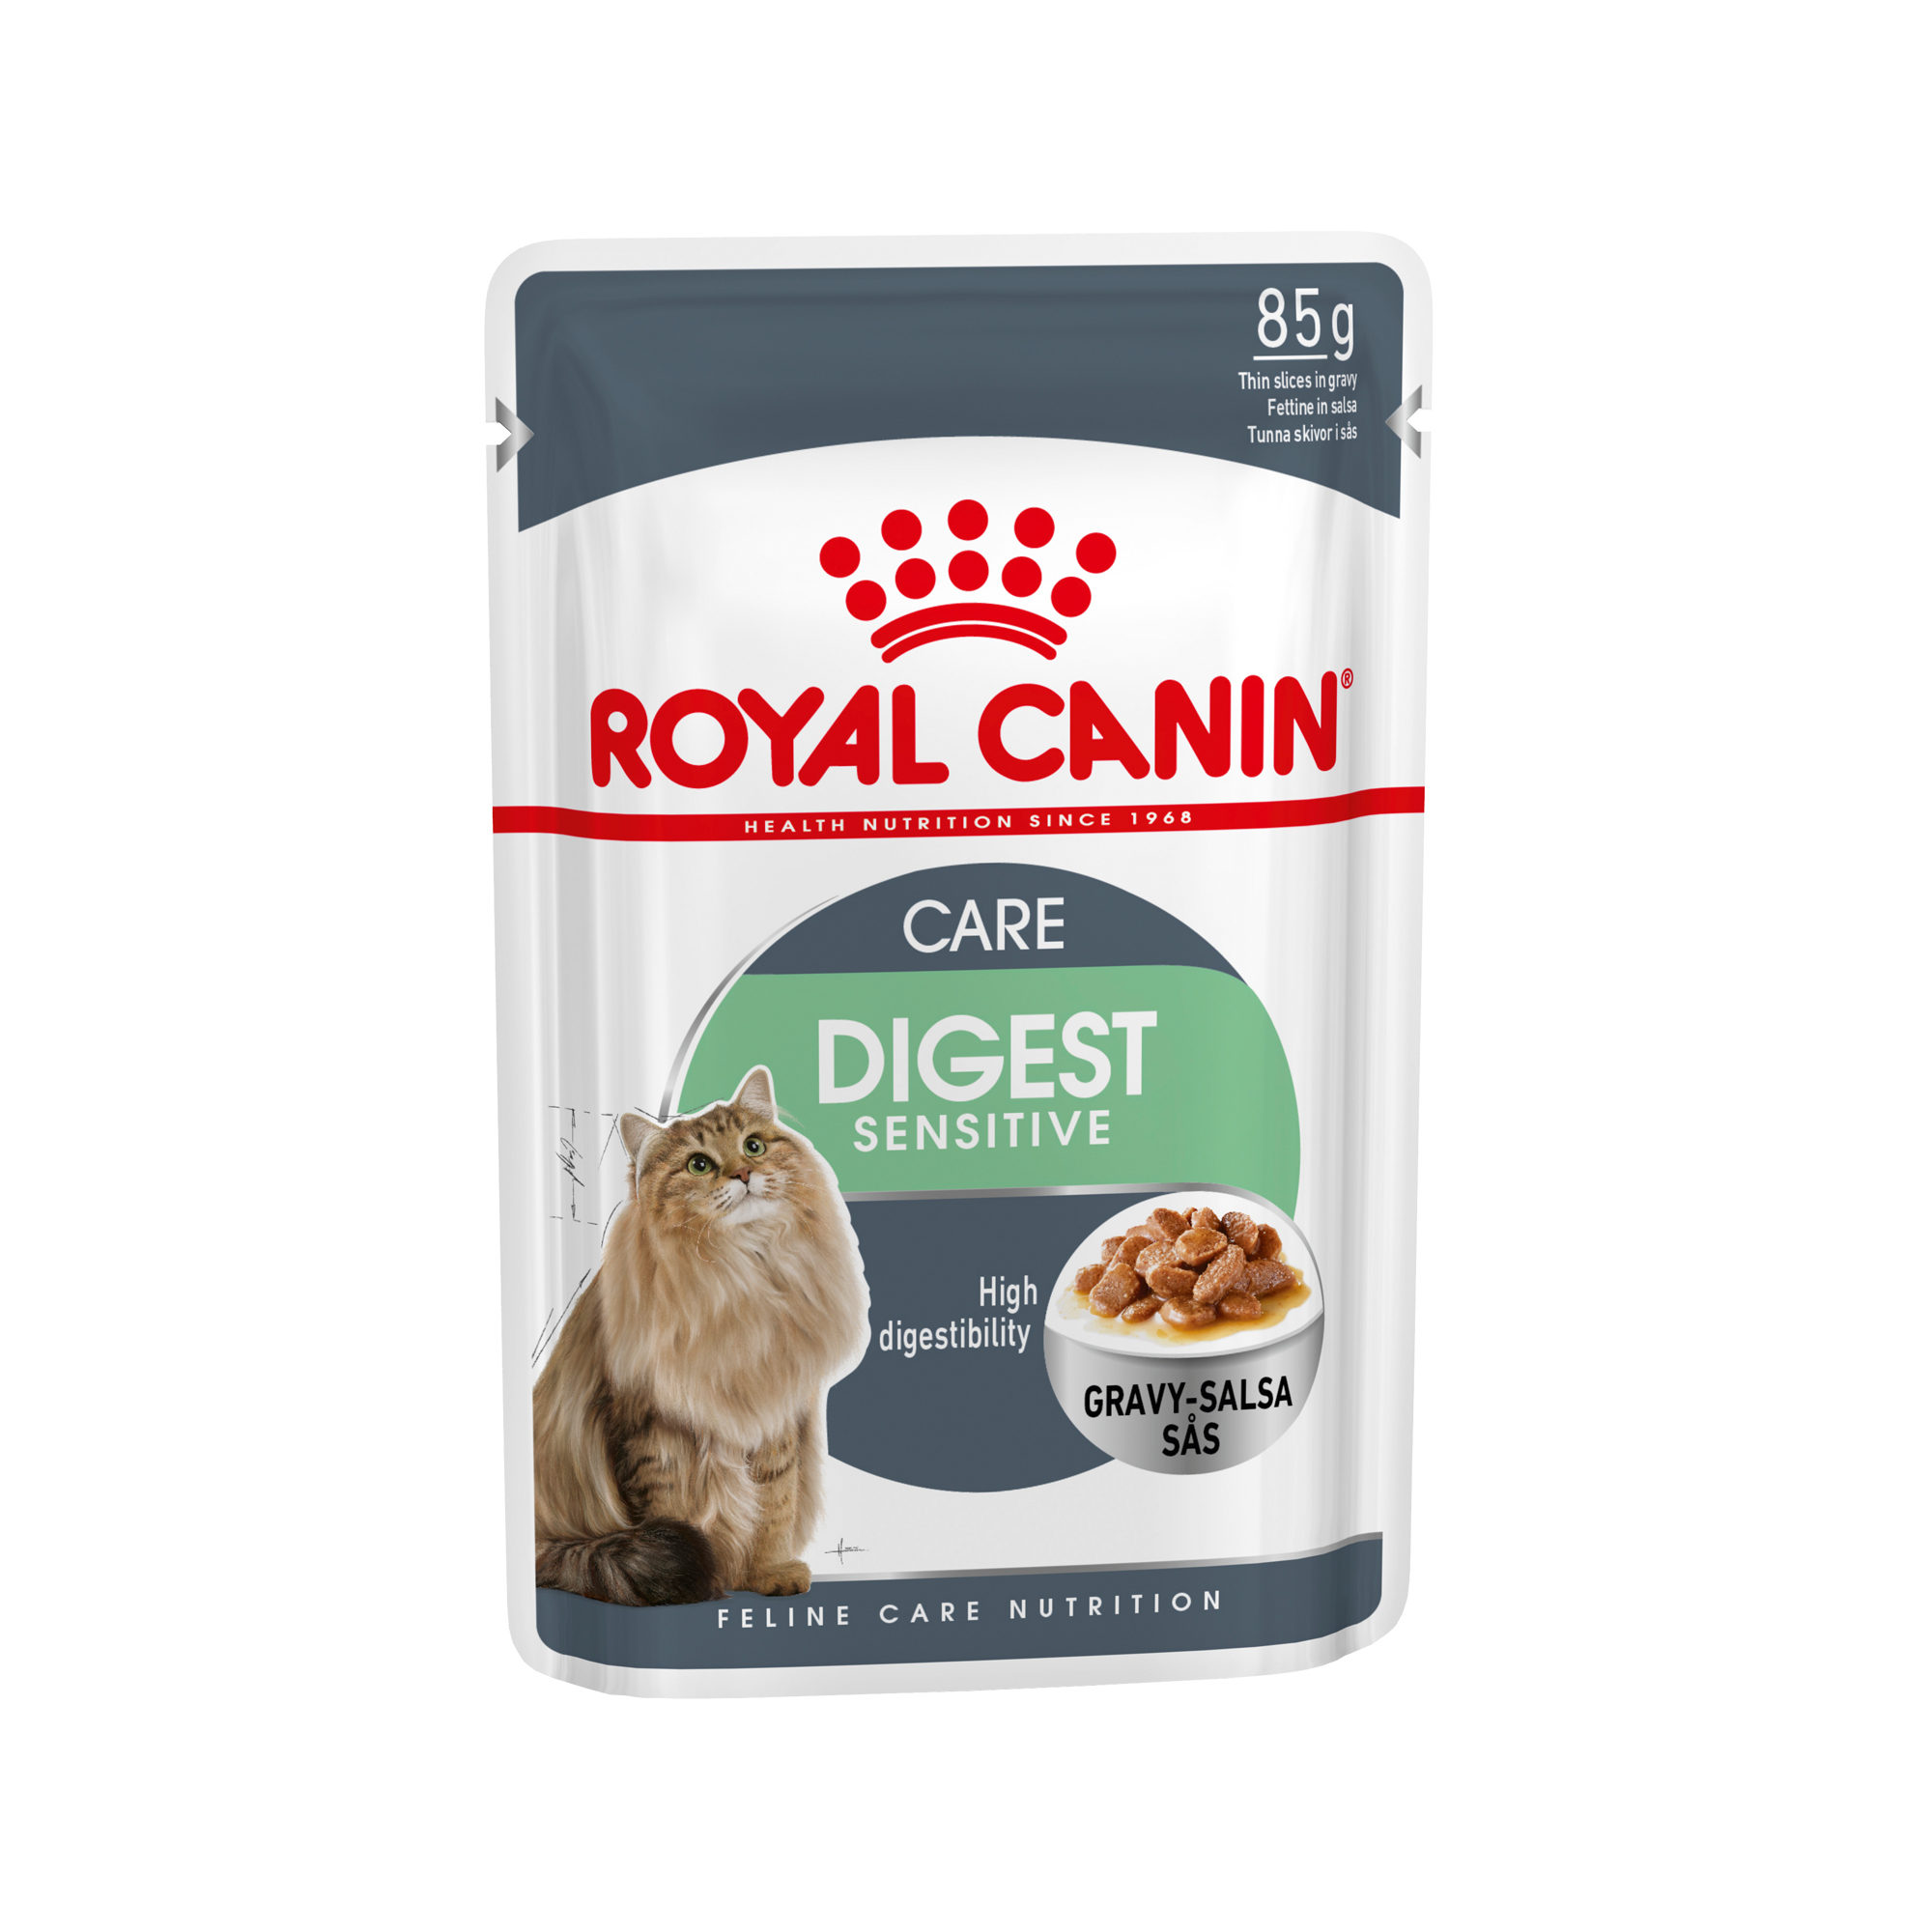 Royal Canin Digest Sensitive in Gravy - Sachet